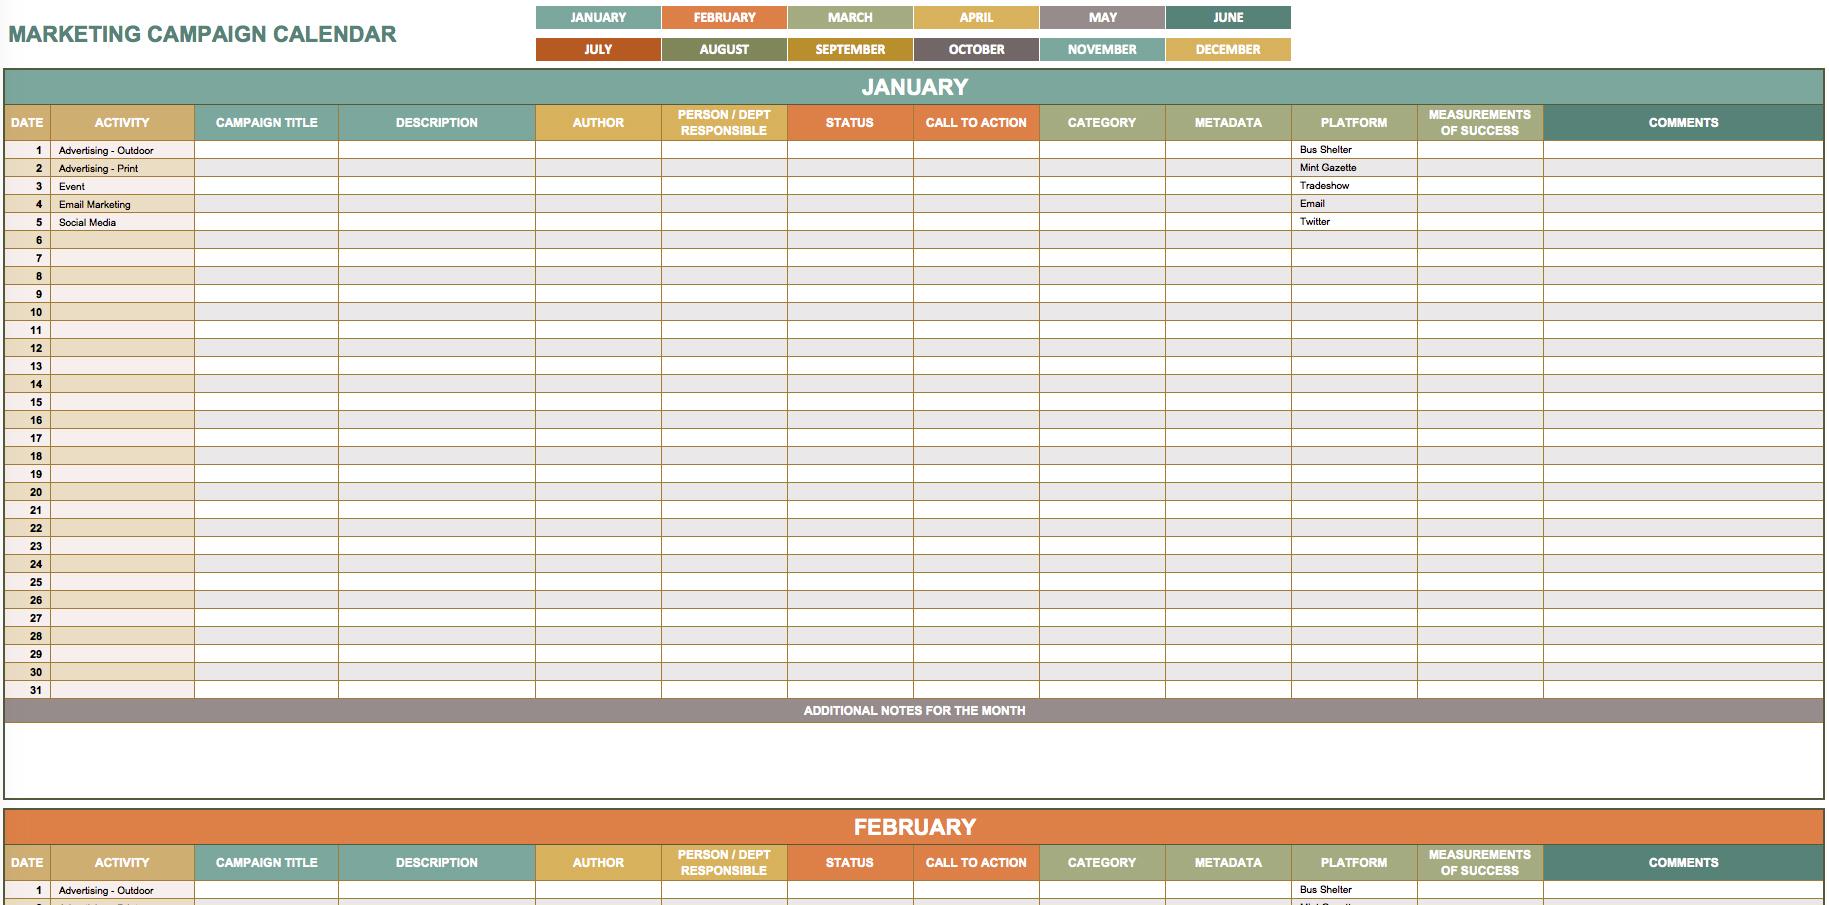 9 Free Marketing Calendar Templates For Excel - Smartsheet To Marketing Calendar Template Google Docs